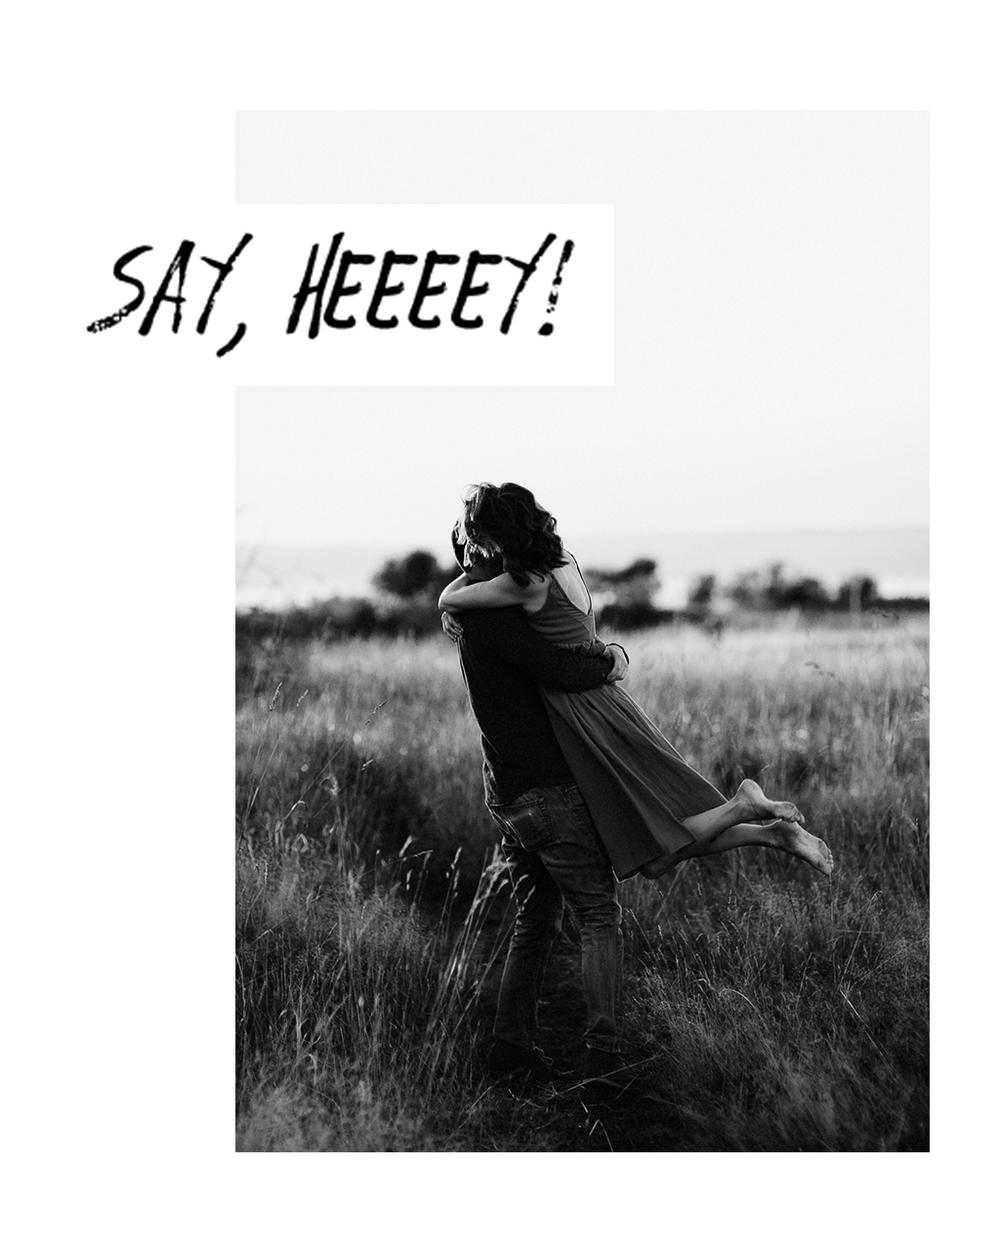 say hey image.png